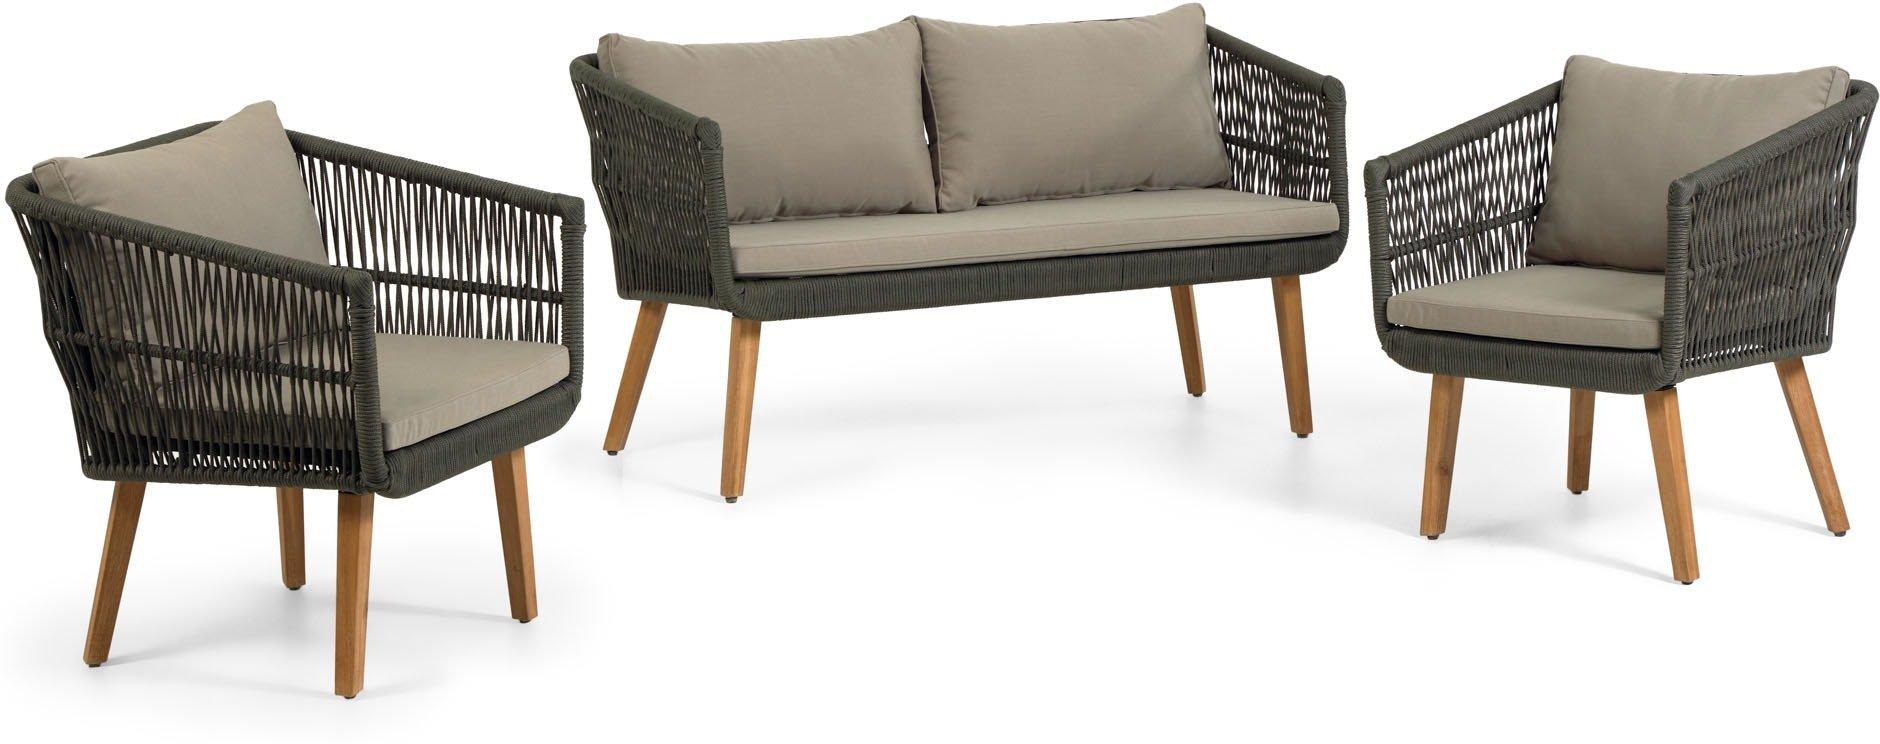 Køb Inti, Udendørs sofasæt by LaForma (H: 75 cm. B: 130 cm. L: 67 cm., Grøn)